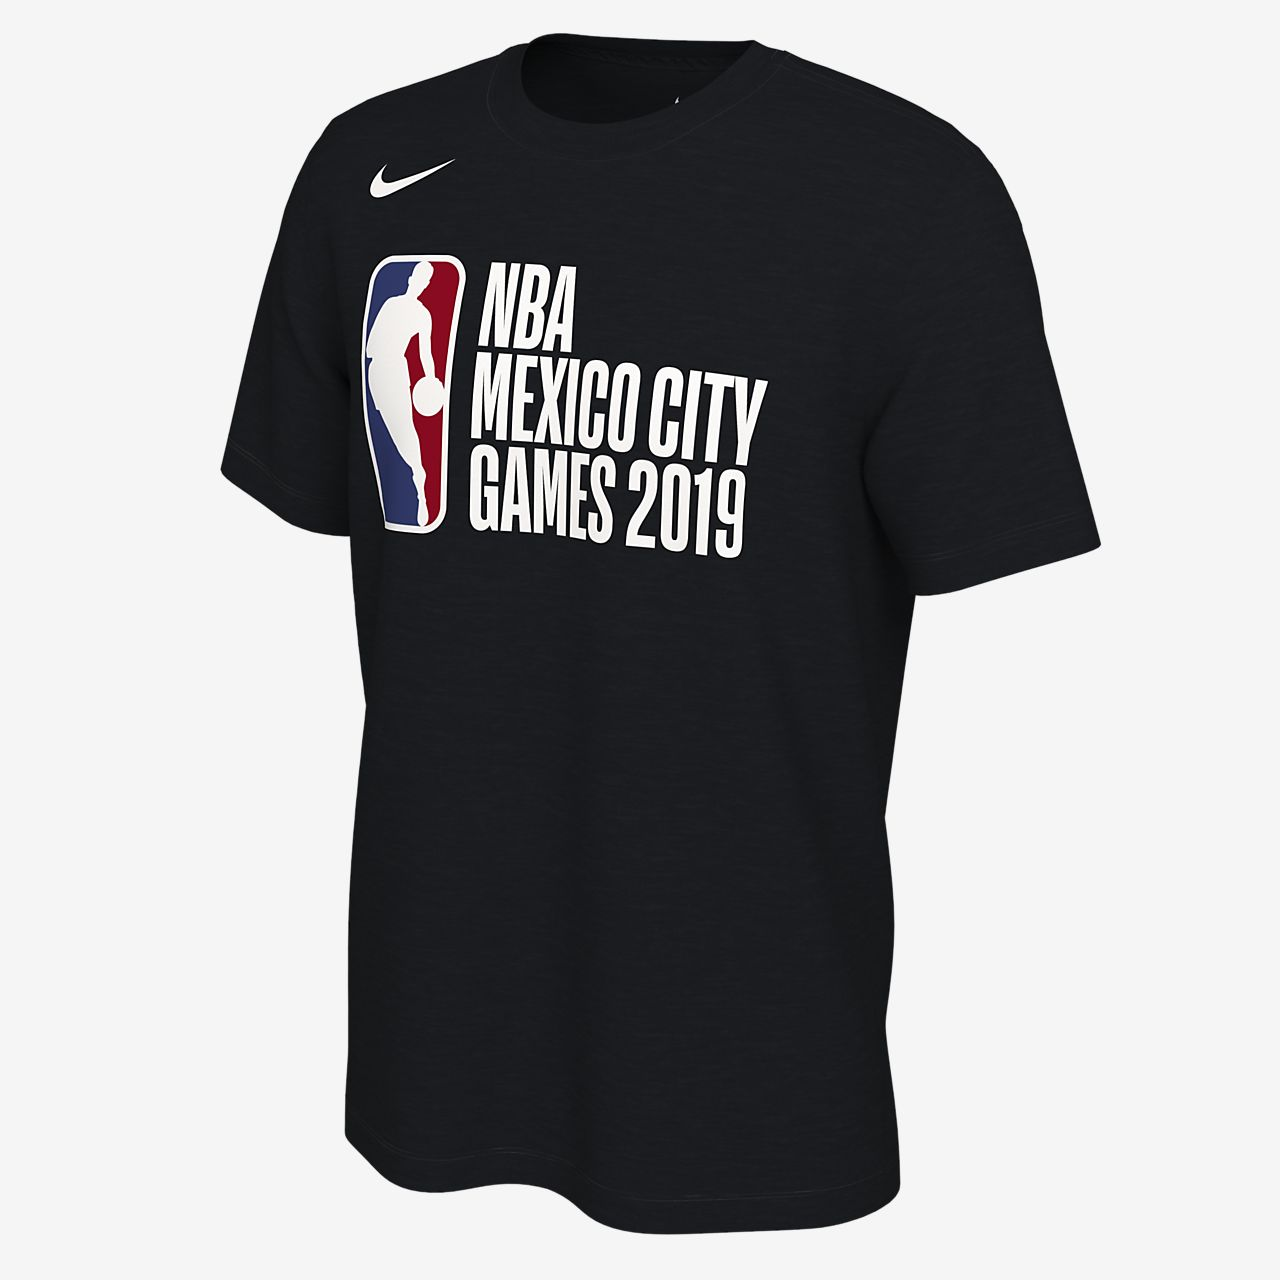 Playera Nike NBA para hombre Global Games Mexico City